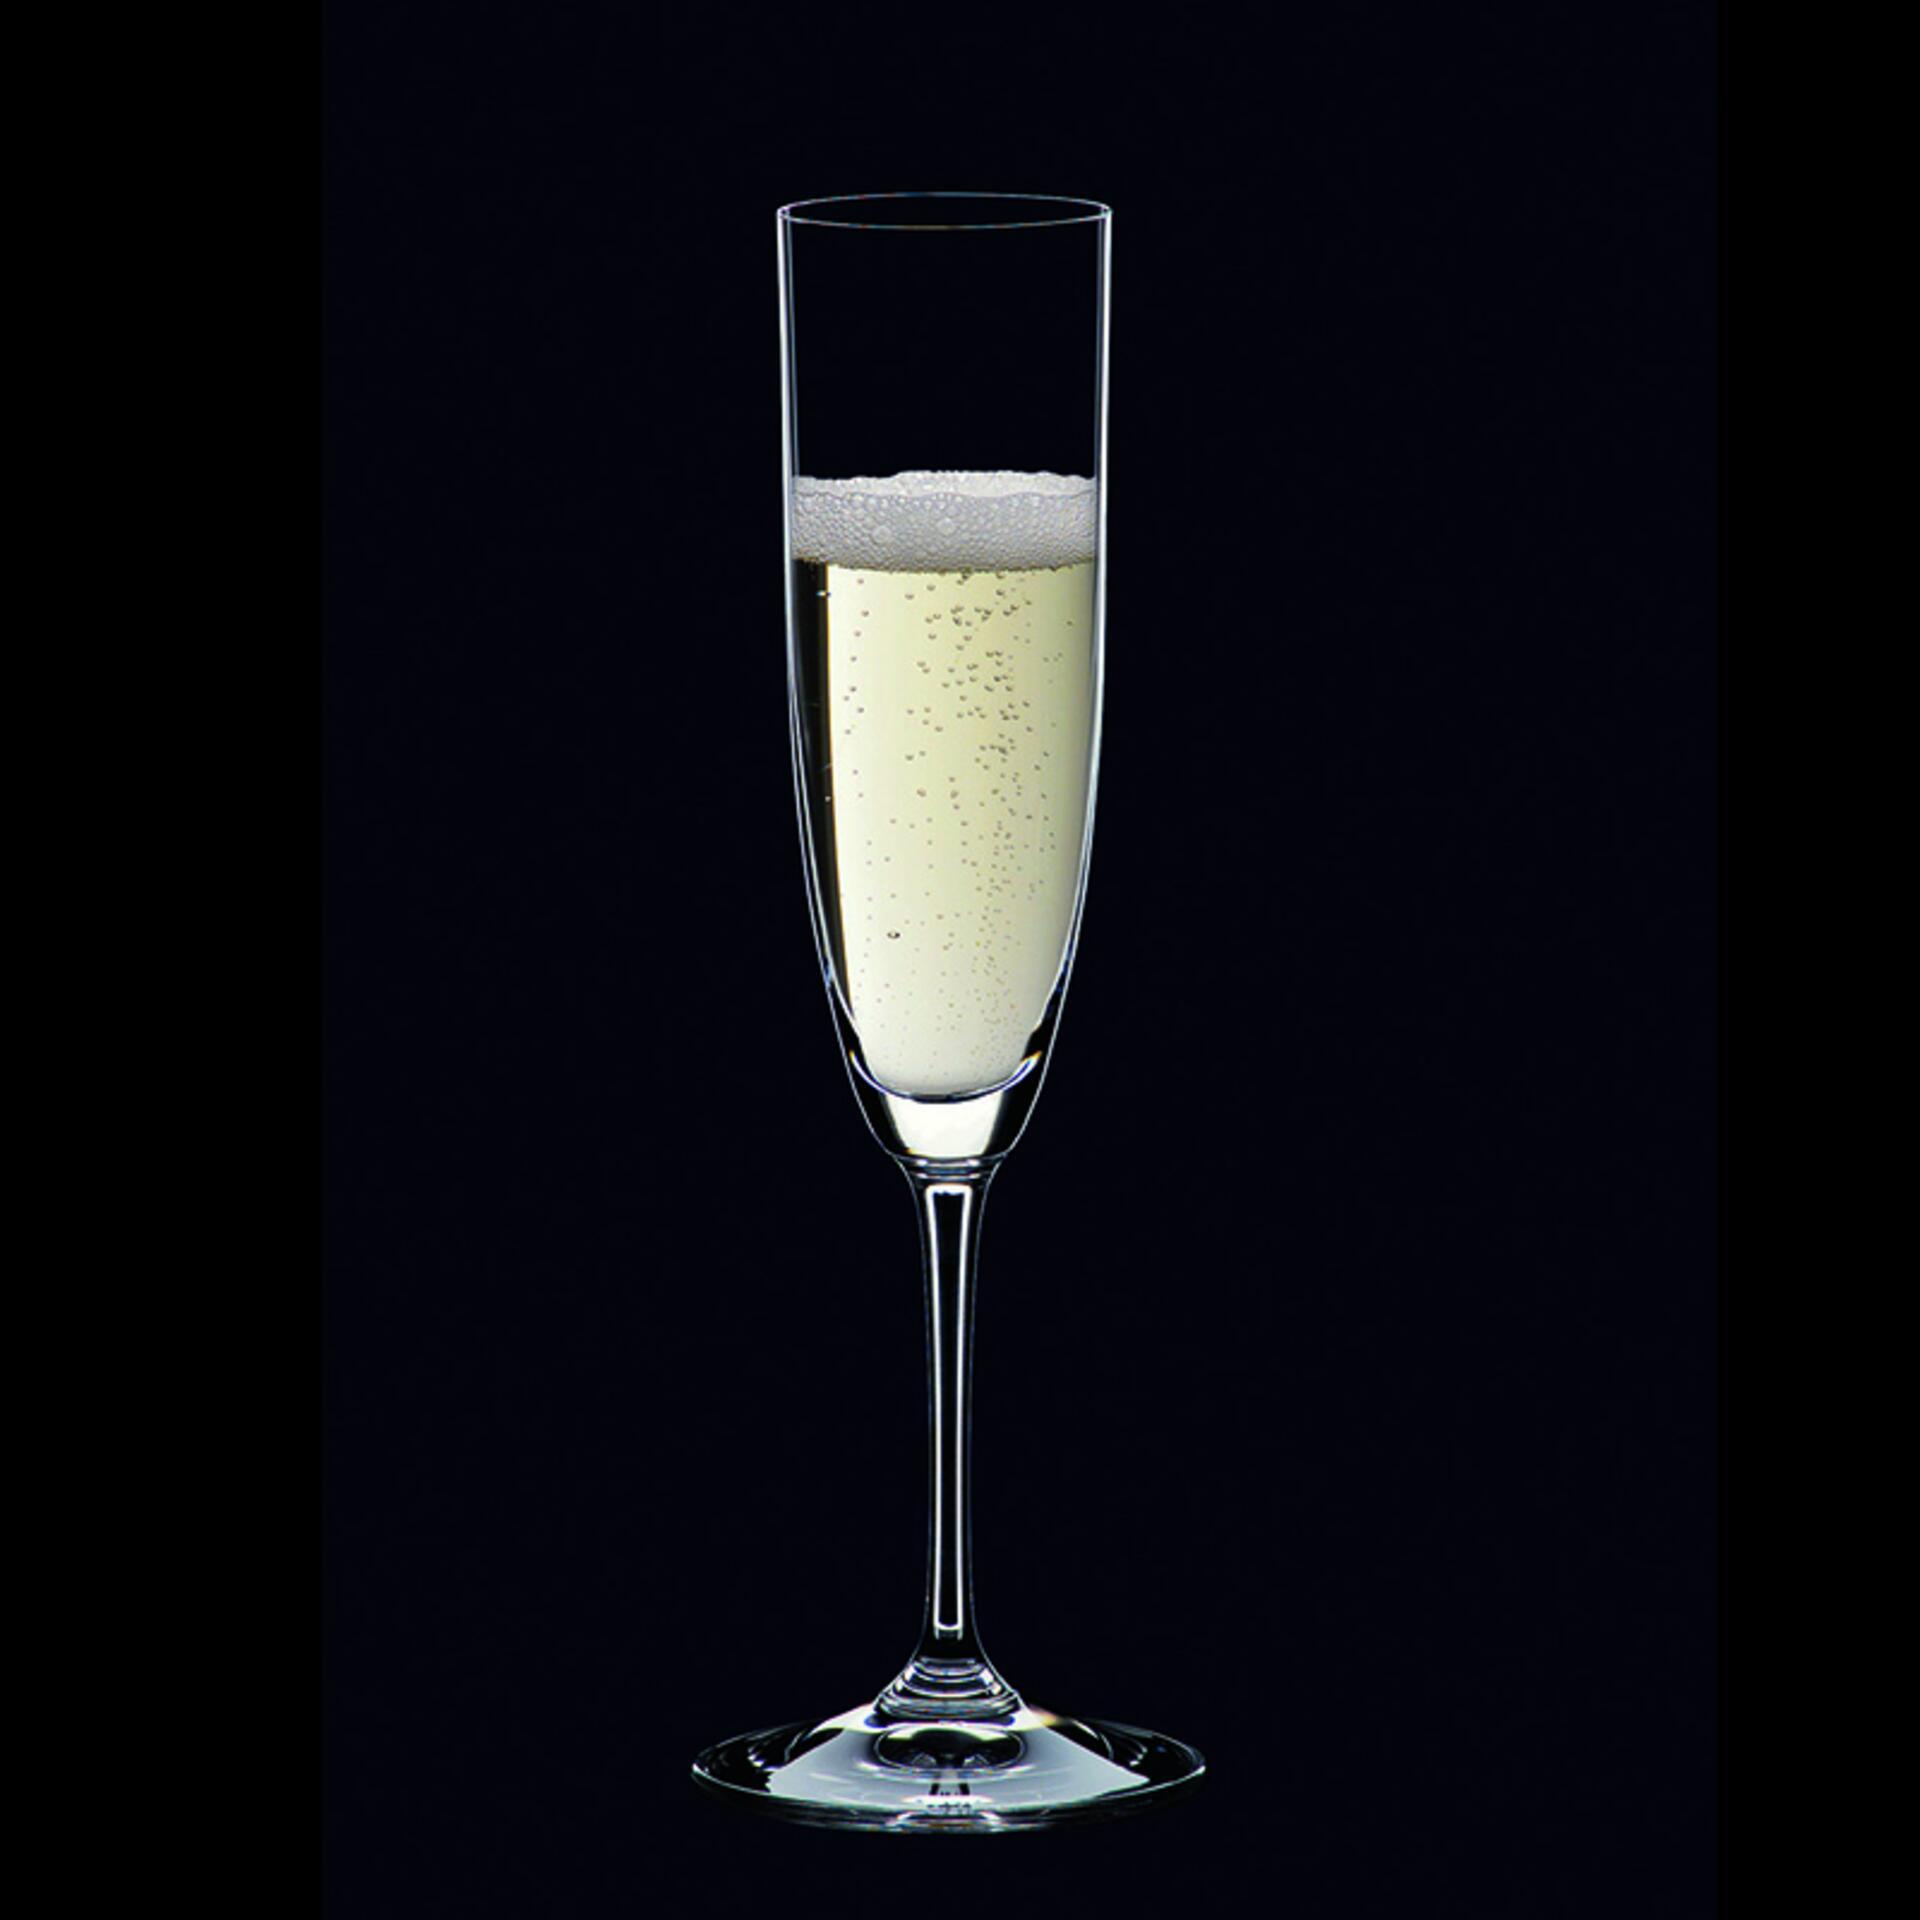 Riedel Vinum Champagner Glas 2 Stück 6416/08